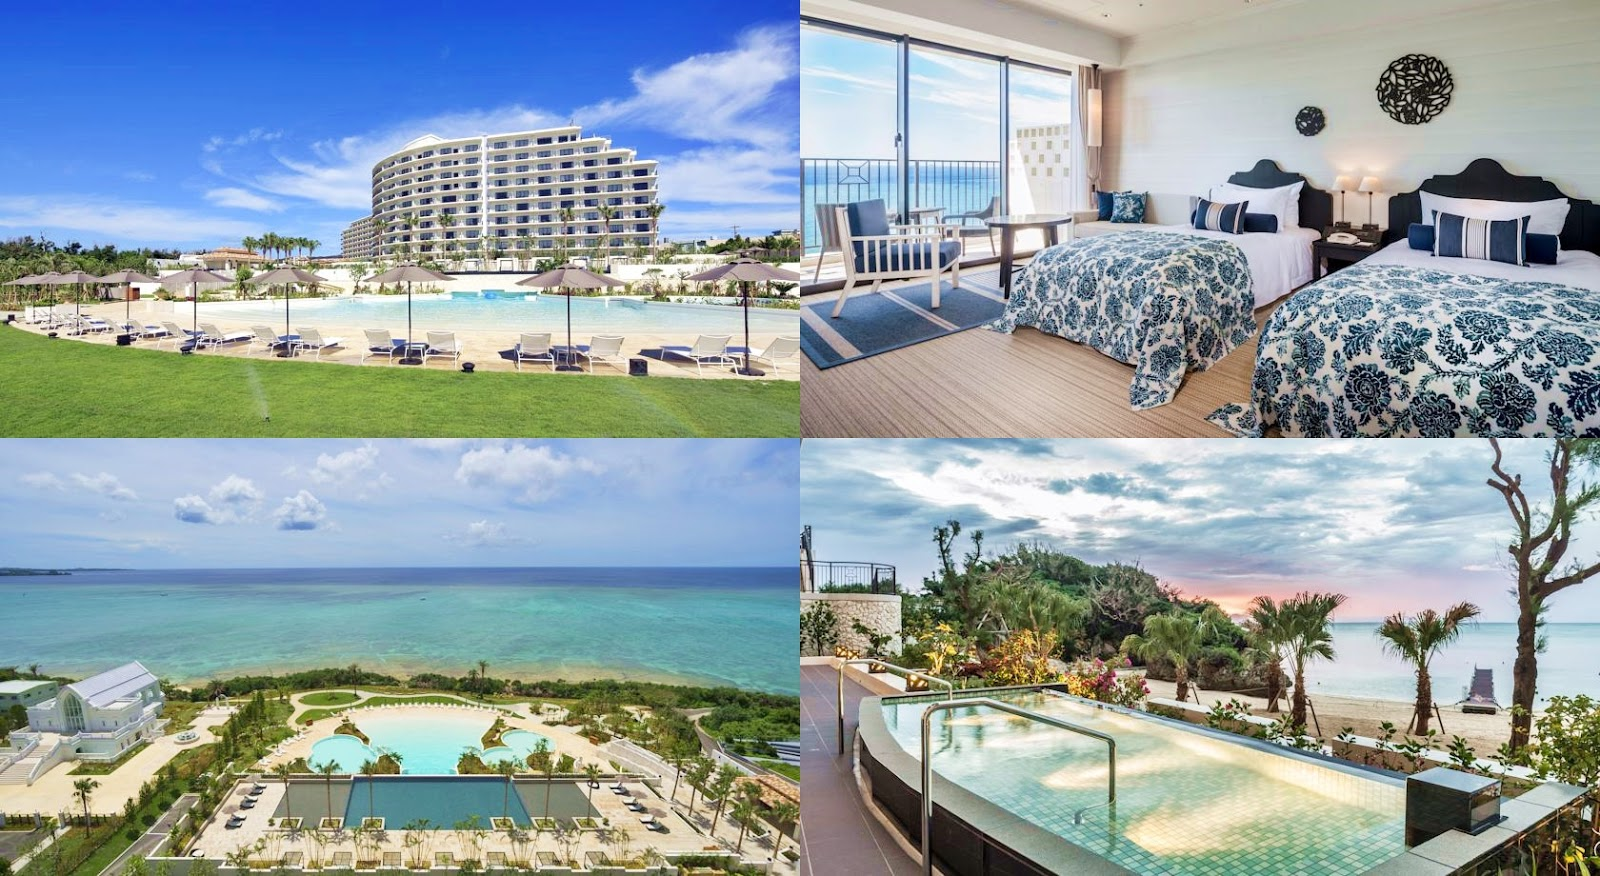 沖繩-住宿-推薦-沖繩蒙特利水療度假酒店-Hotel-Monterey-Okinawa-Spa&Resort-Okinawa-hotel-recommendation